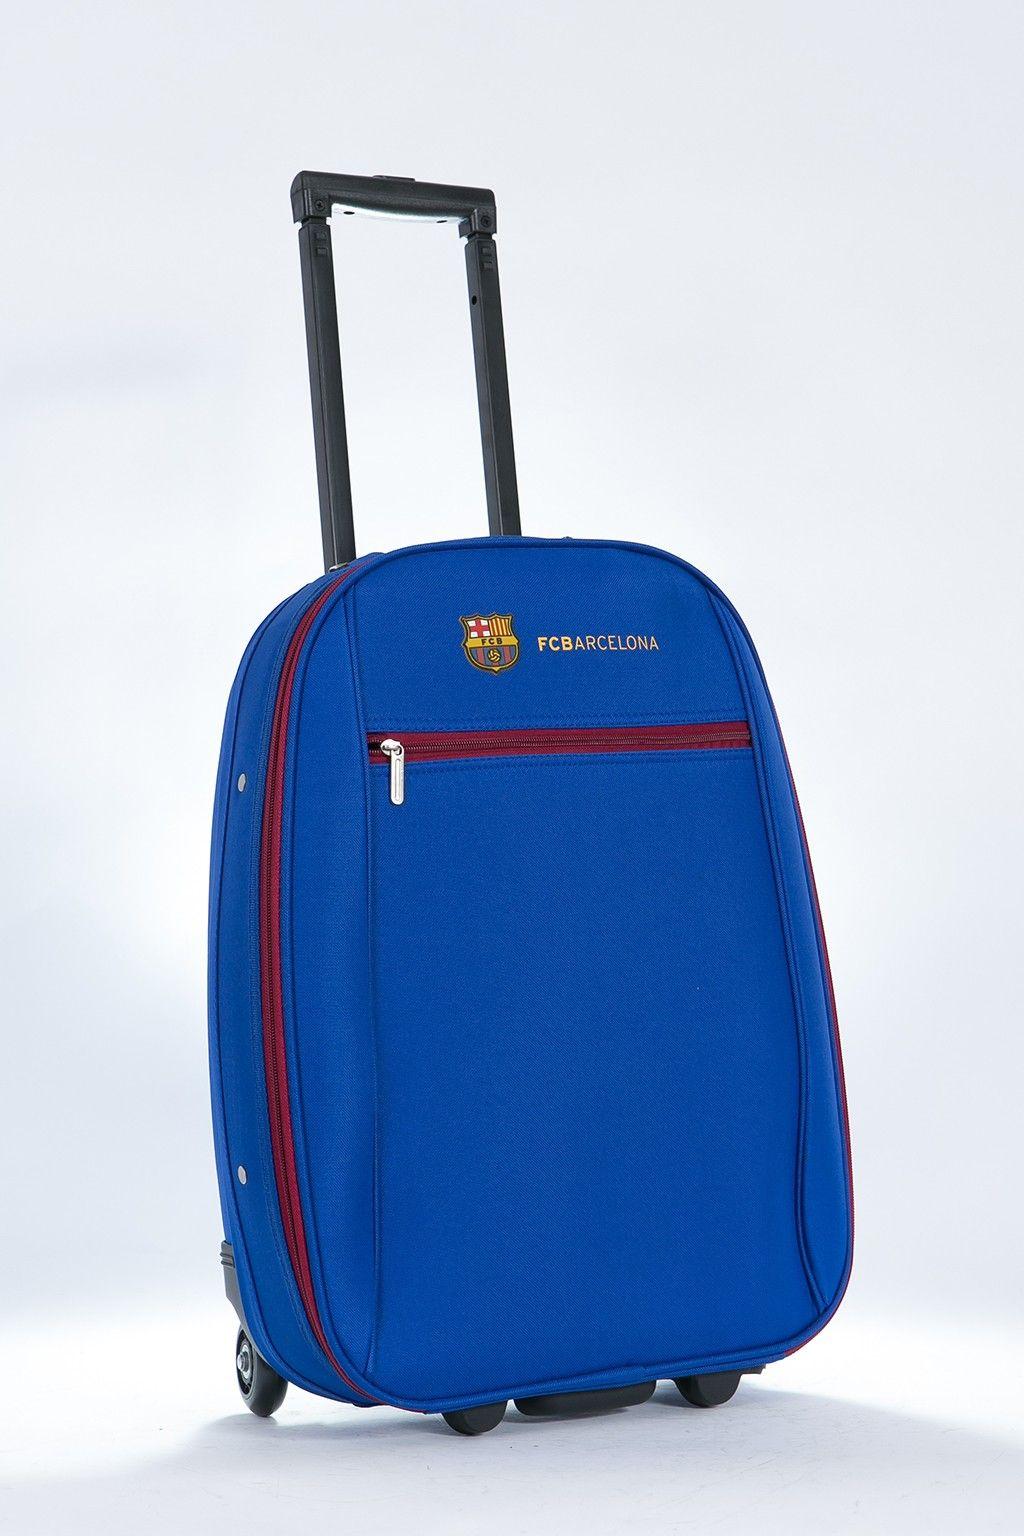 e30da575f59b0 Maleta de viaje del futbol club barcelona especial de cabina